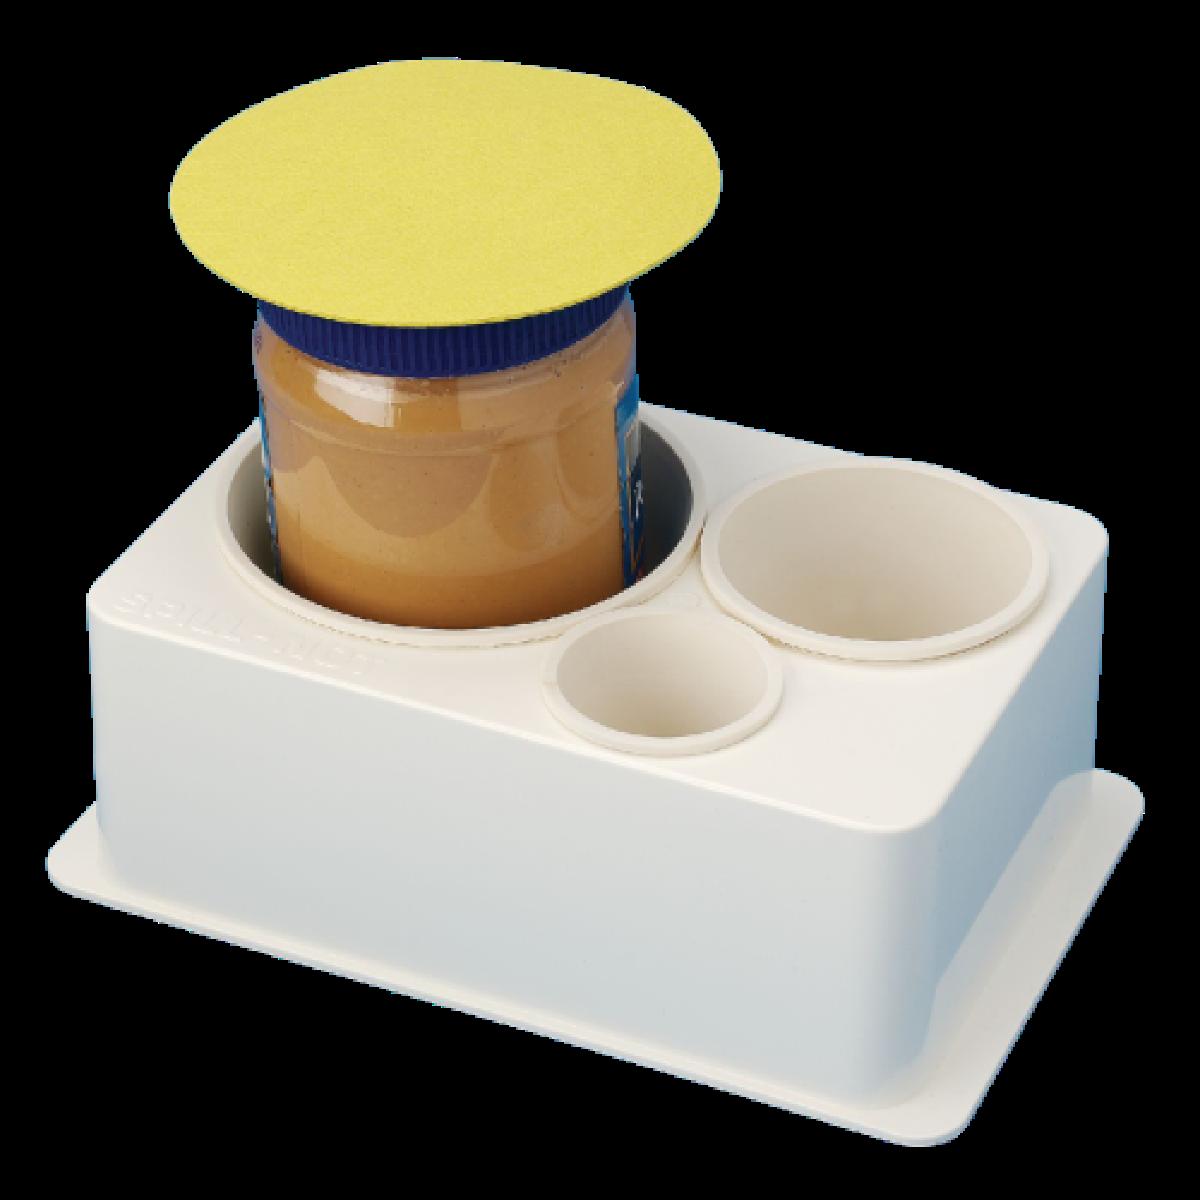 Adaptive Jar Opener